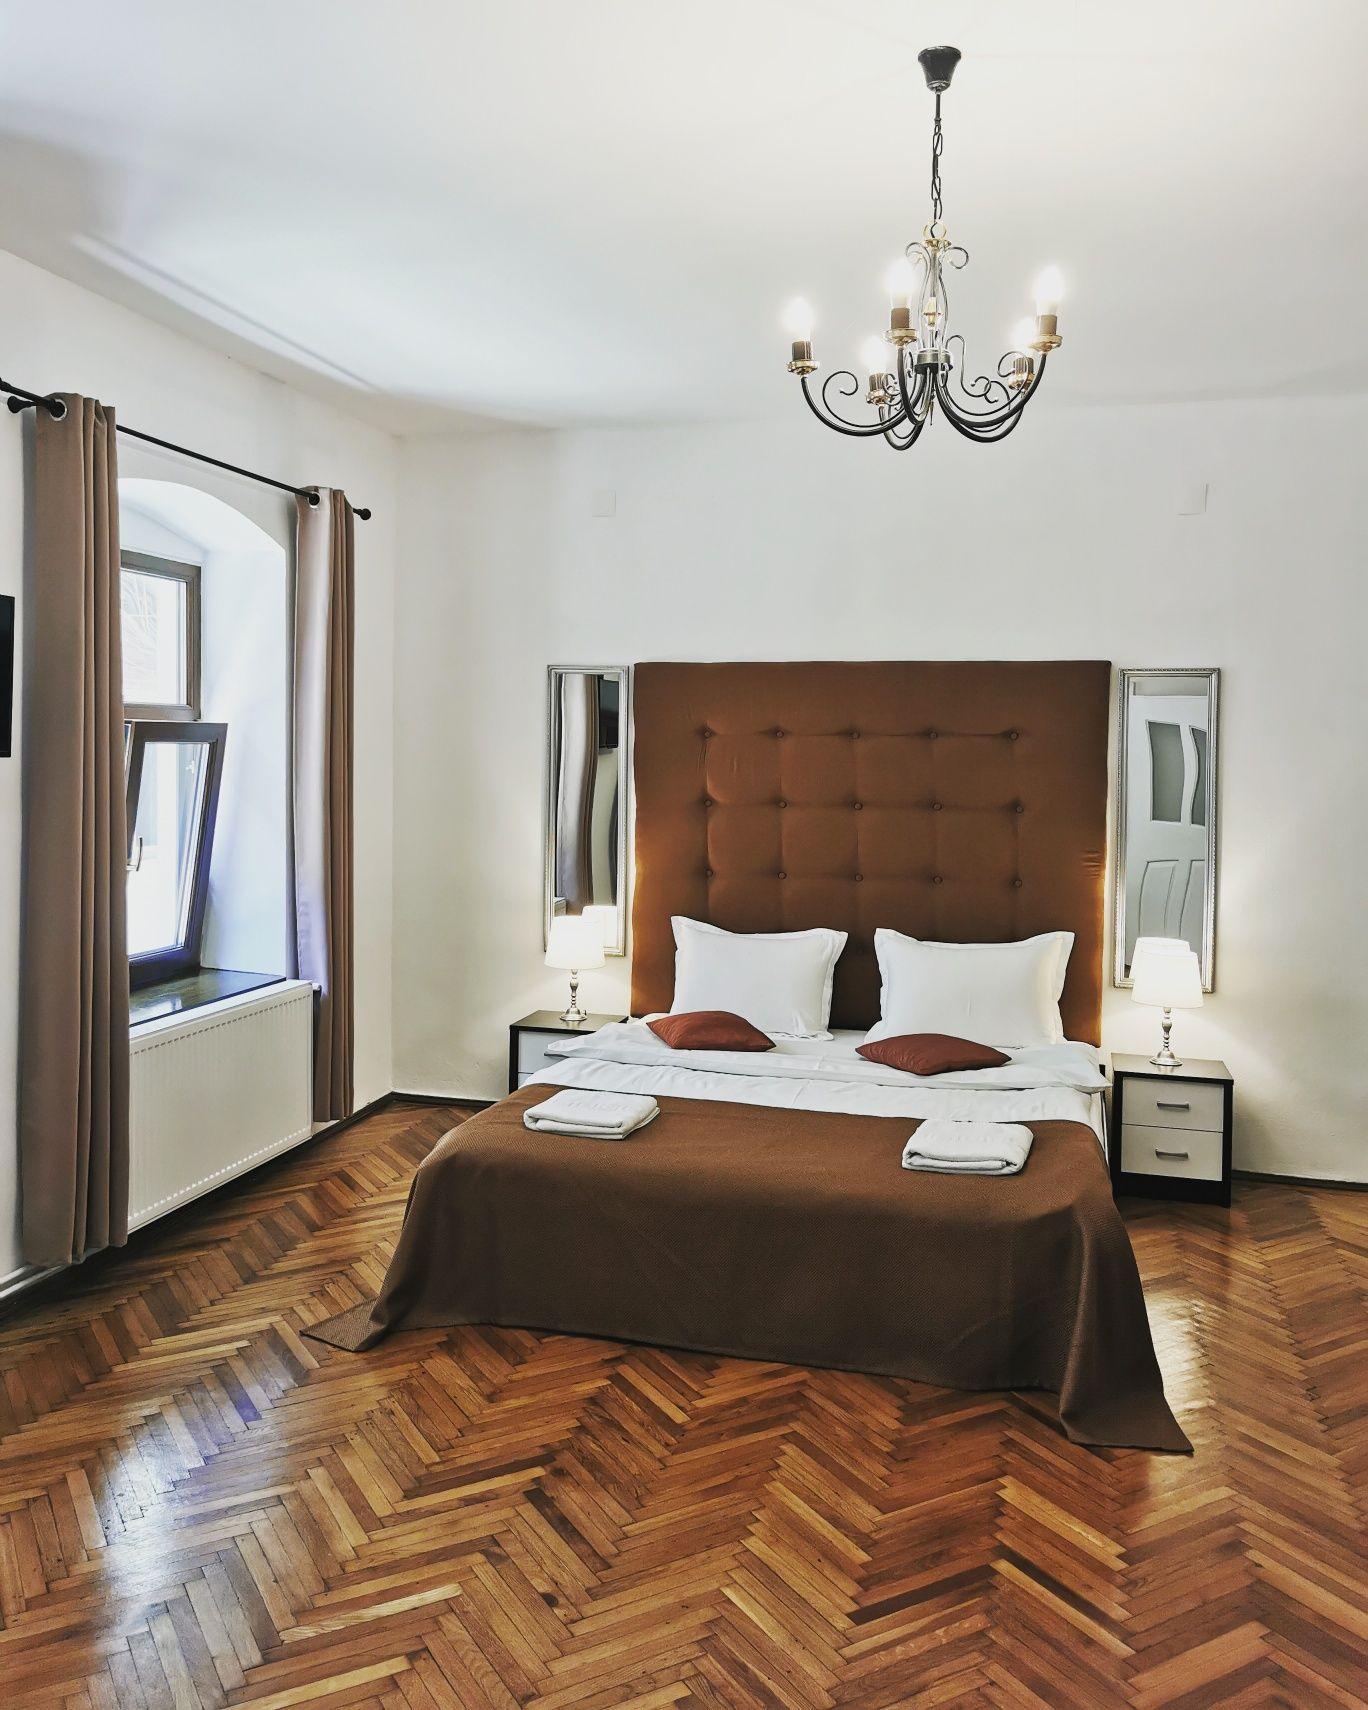 Apartament regim hotelier zona centrala 200 m de Piata Mare!